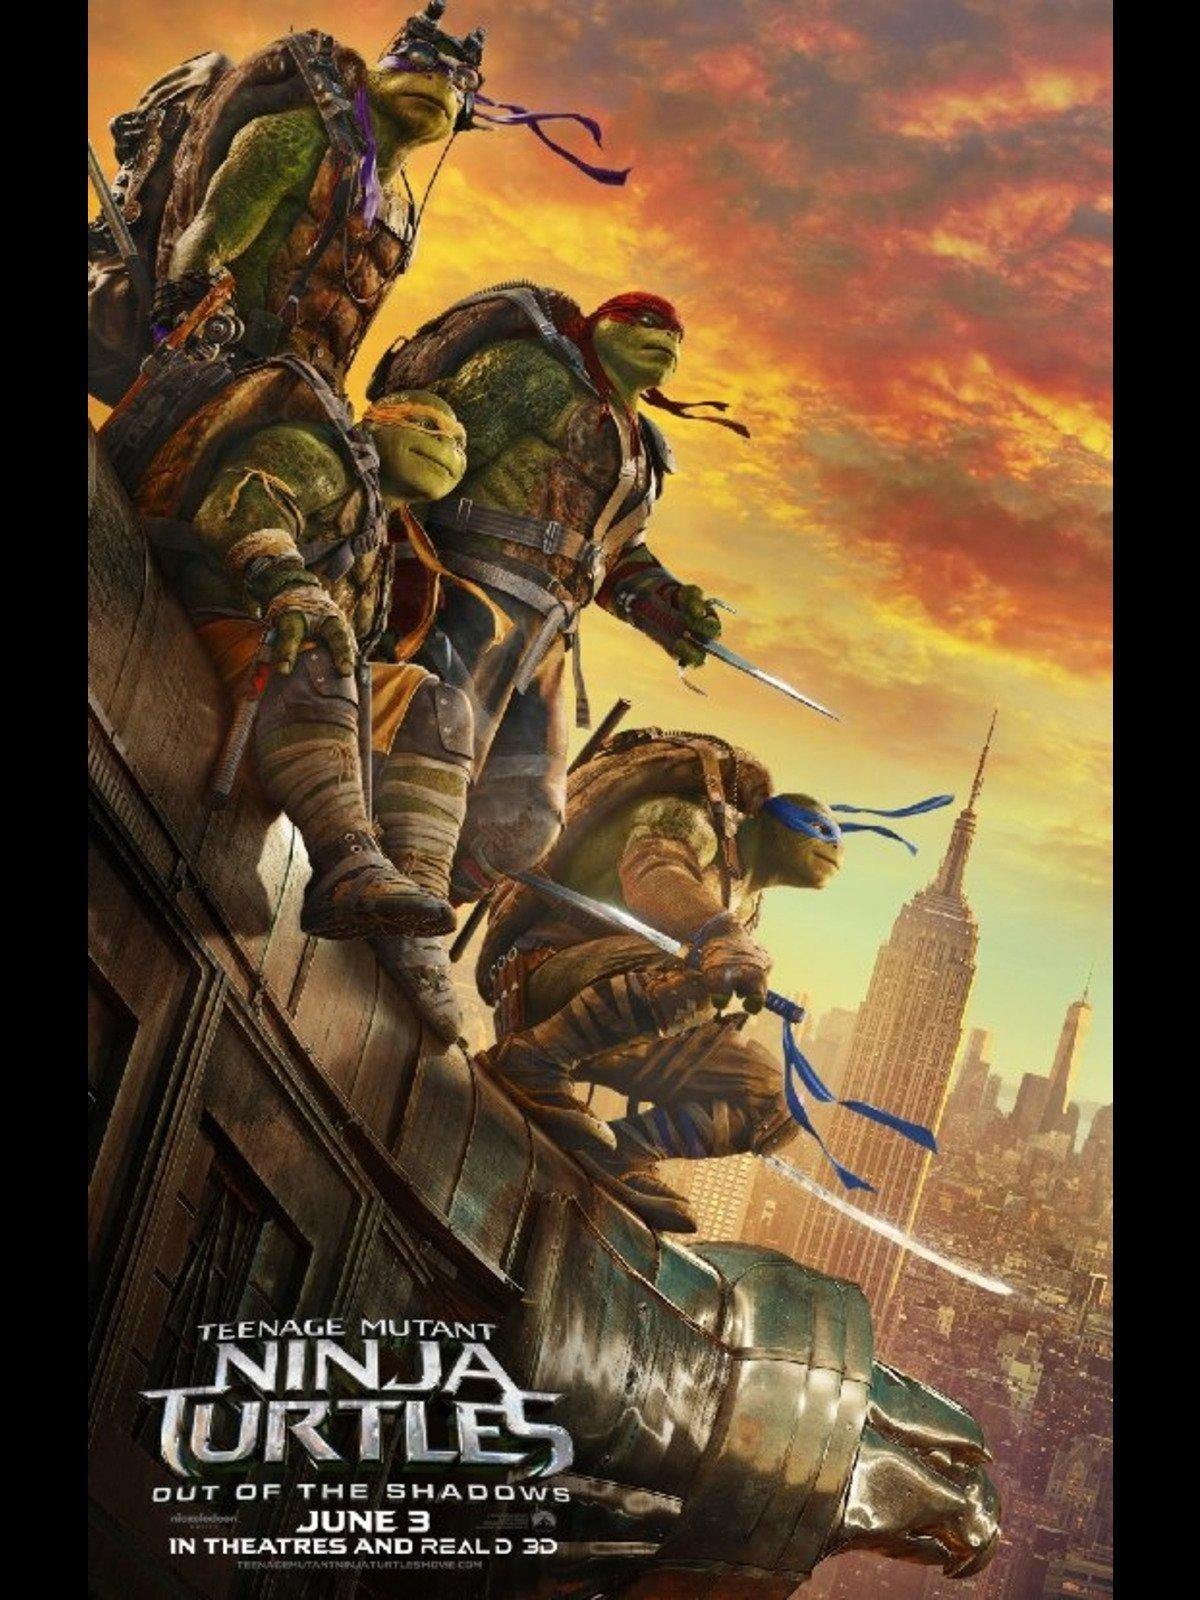 Amazon.com: Watch Teenage Mutant Ninja Turtles: Out Of The ...